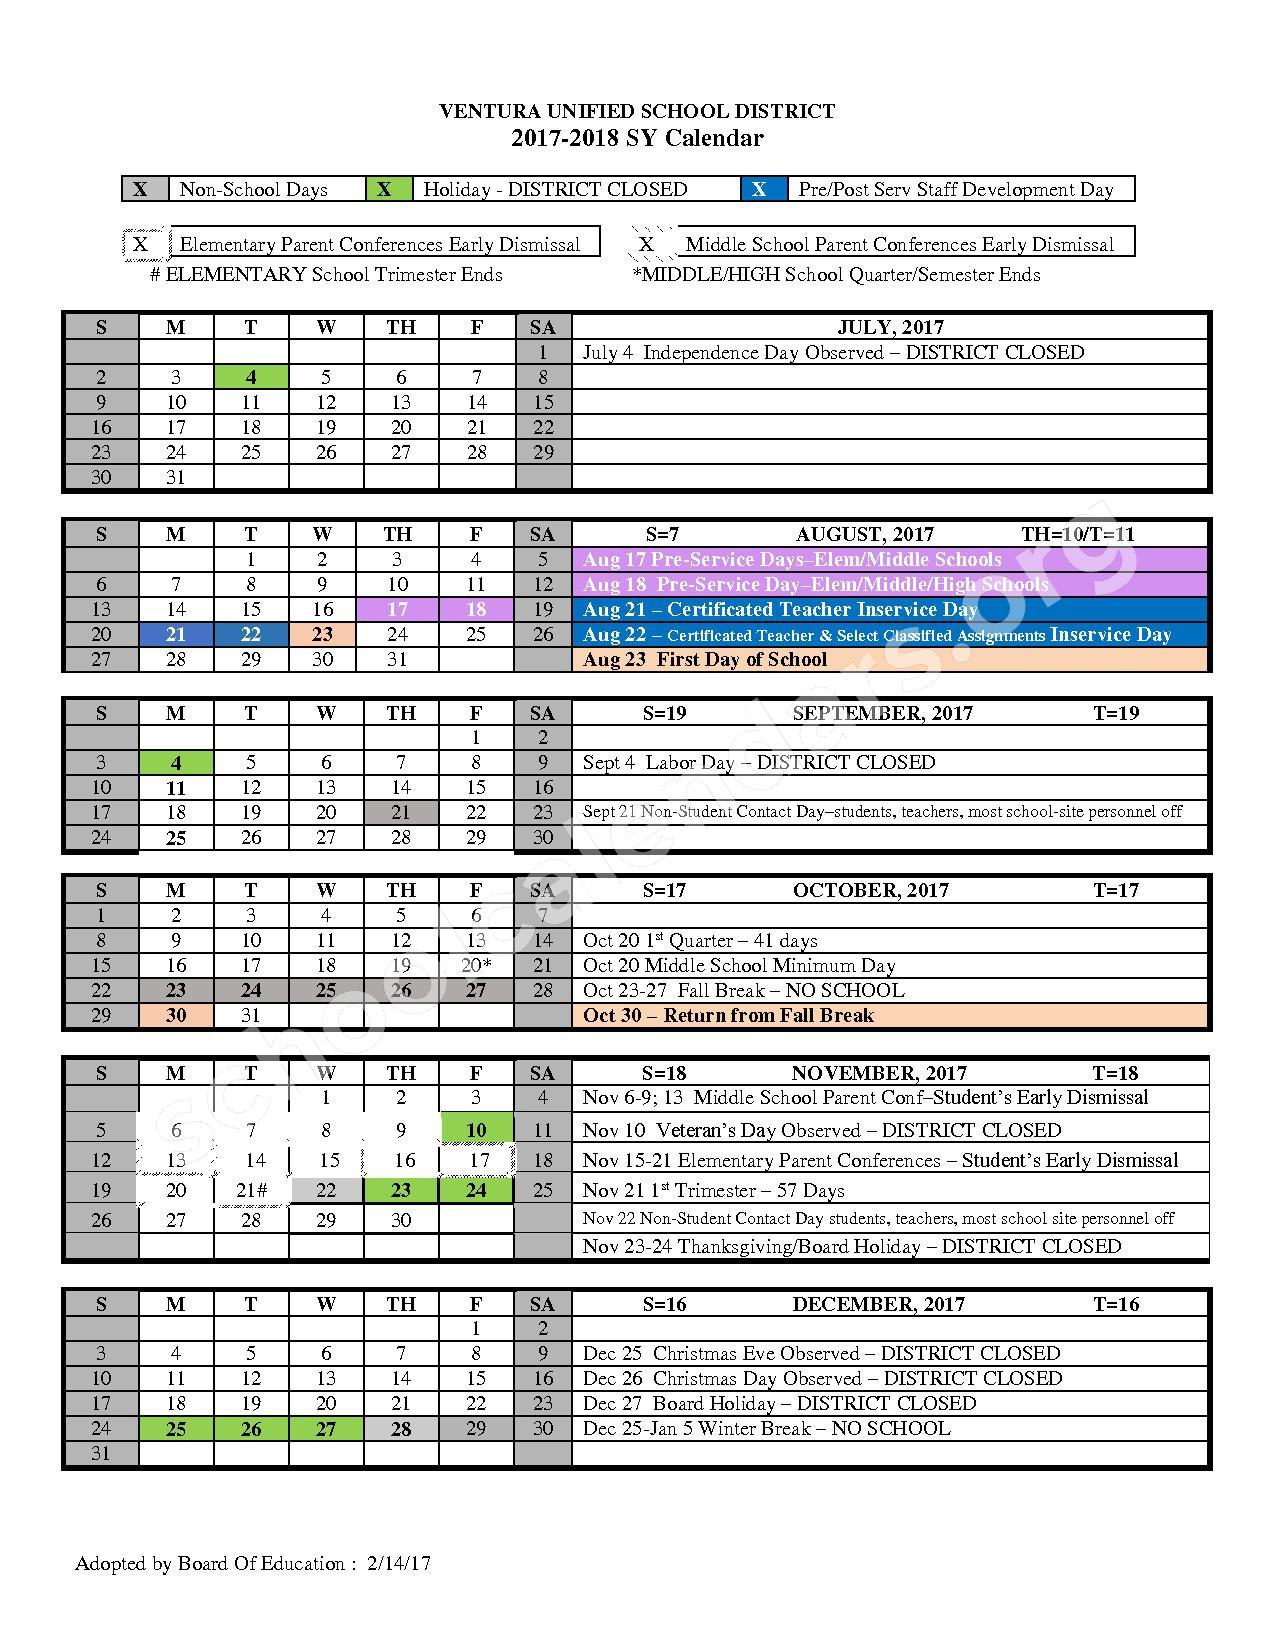 2017 - 2018 School Calendar – Ventura Unified School District – page 1